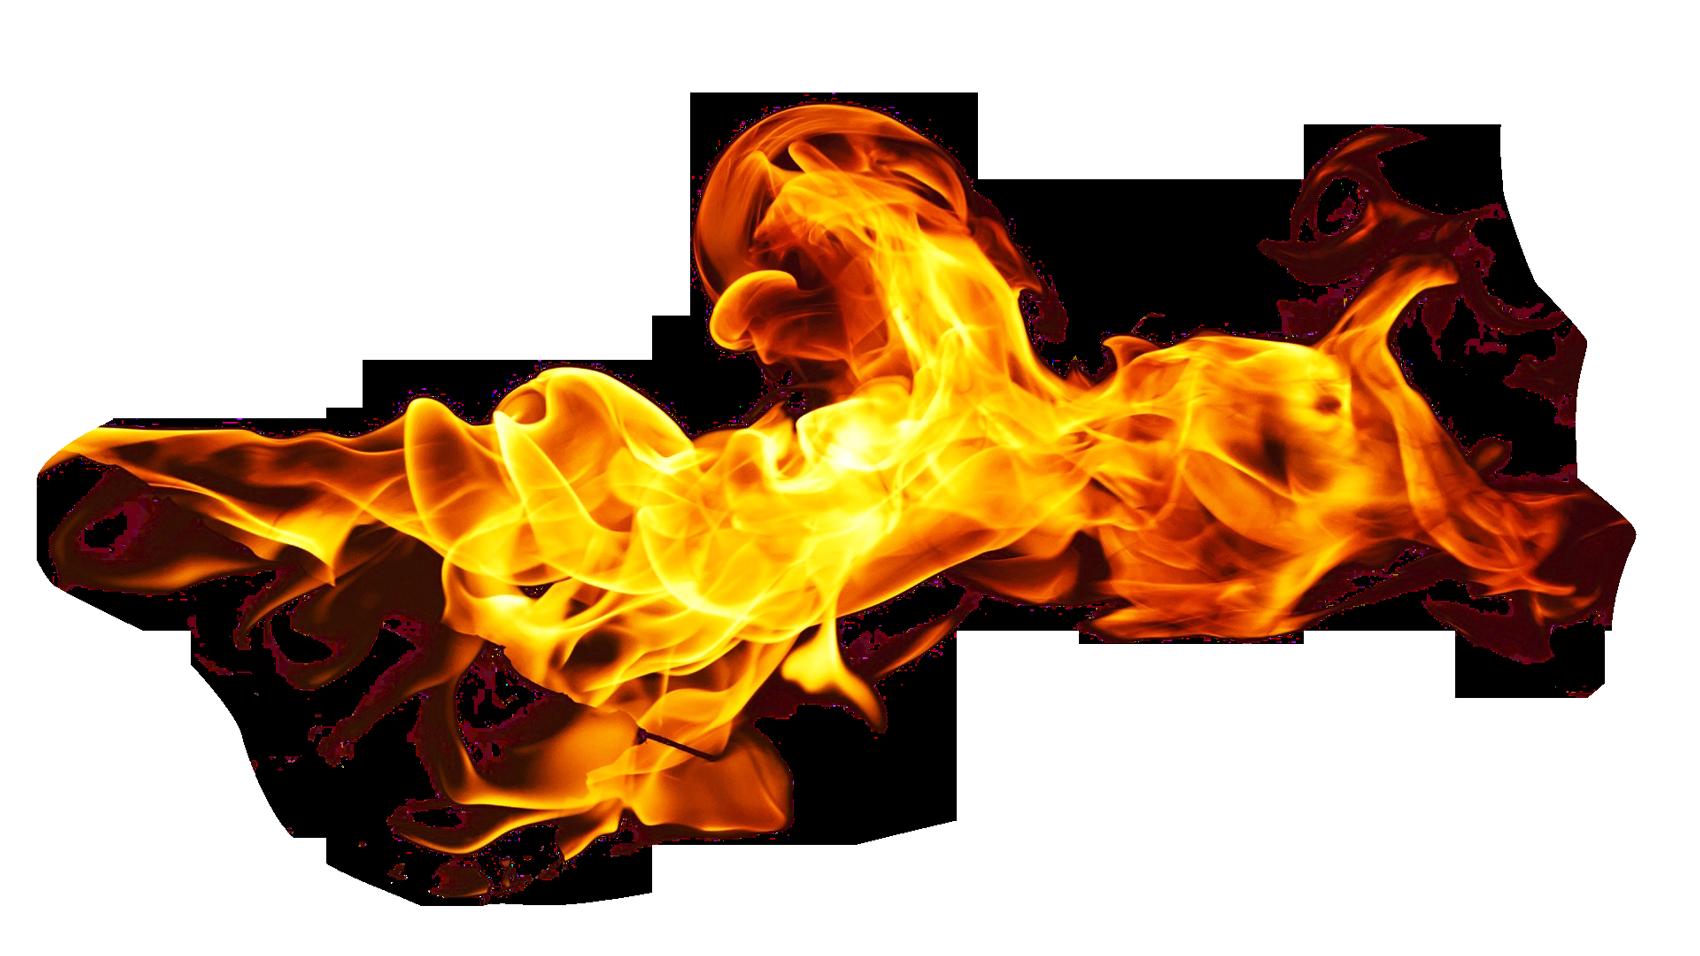 Fire Flame Png Image Fire Image Image Png Images